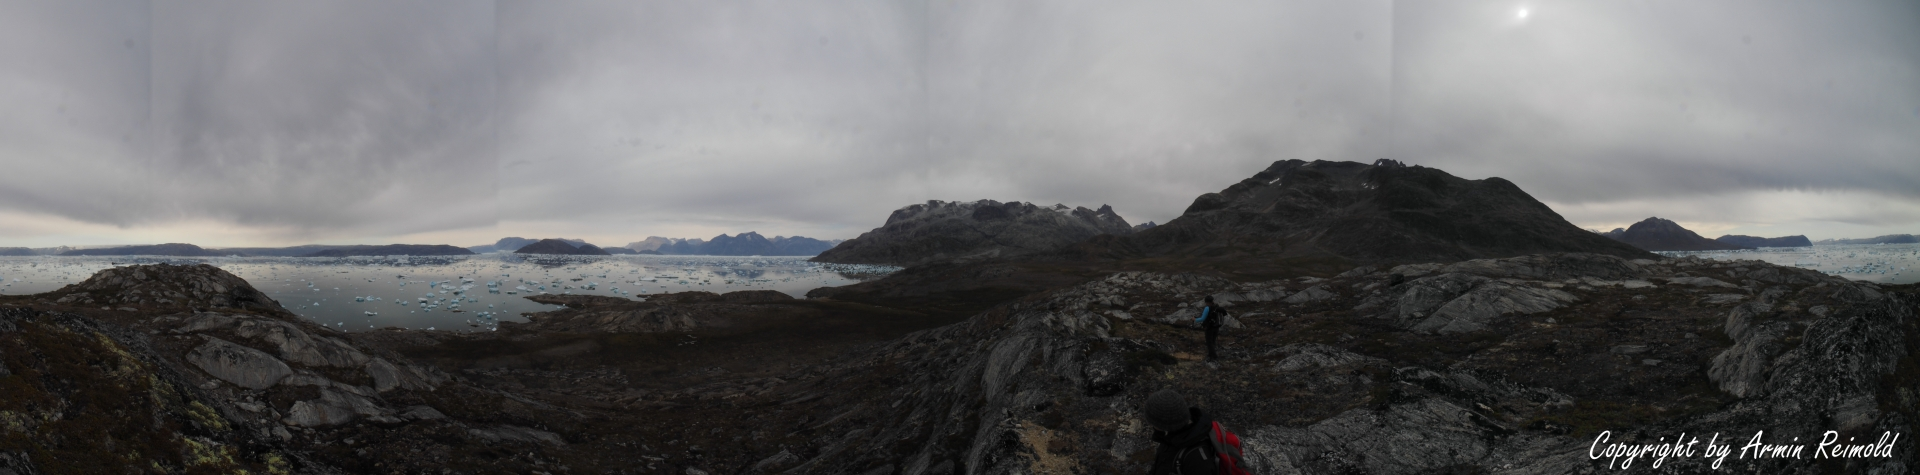 20140808-P7301673_Panorama